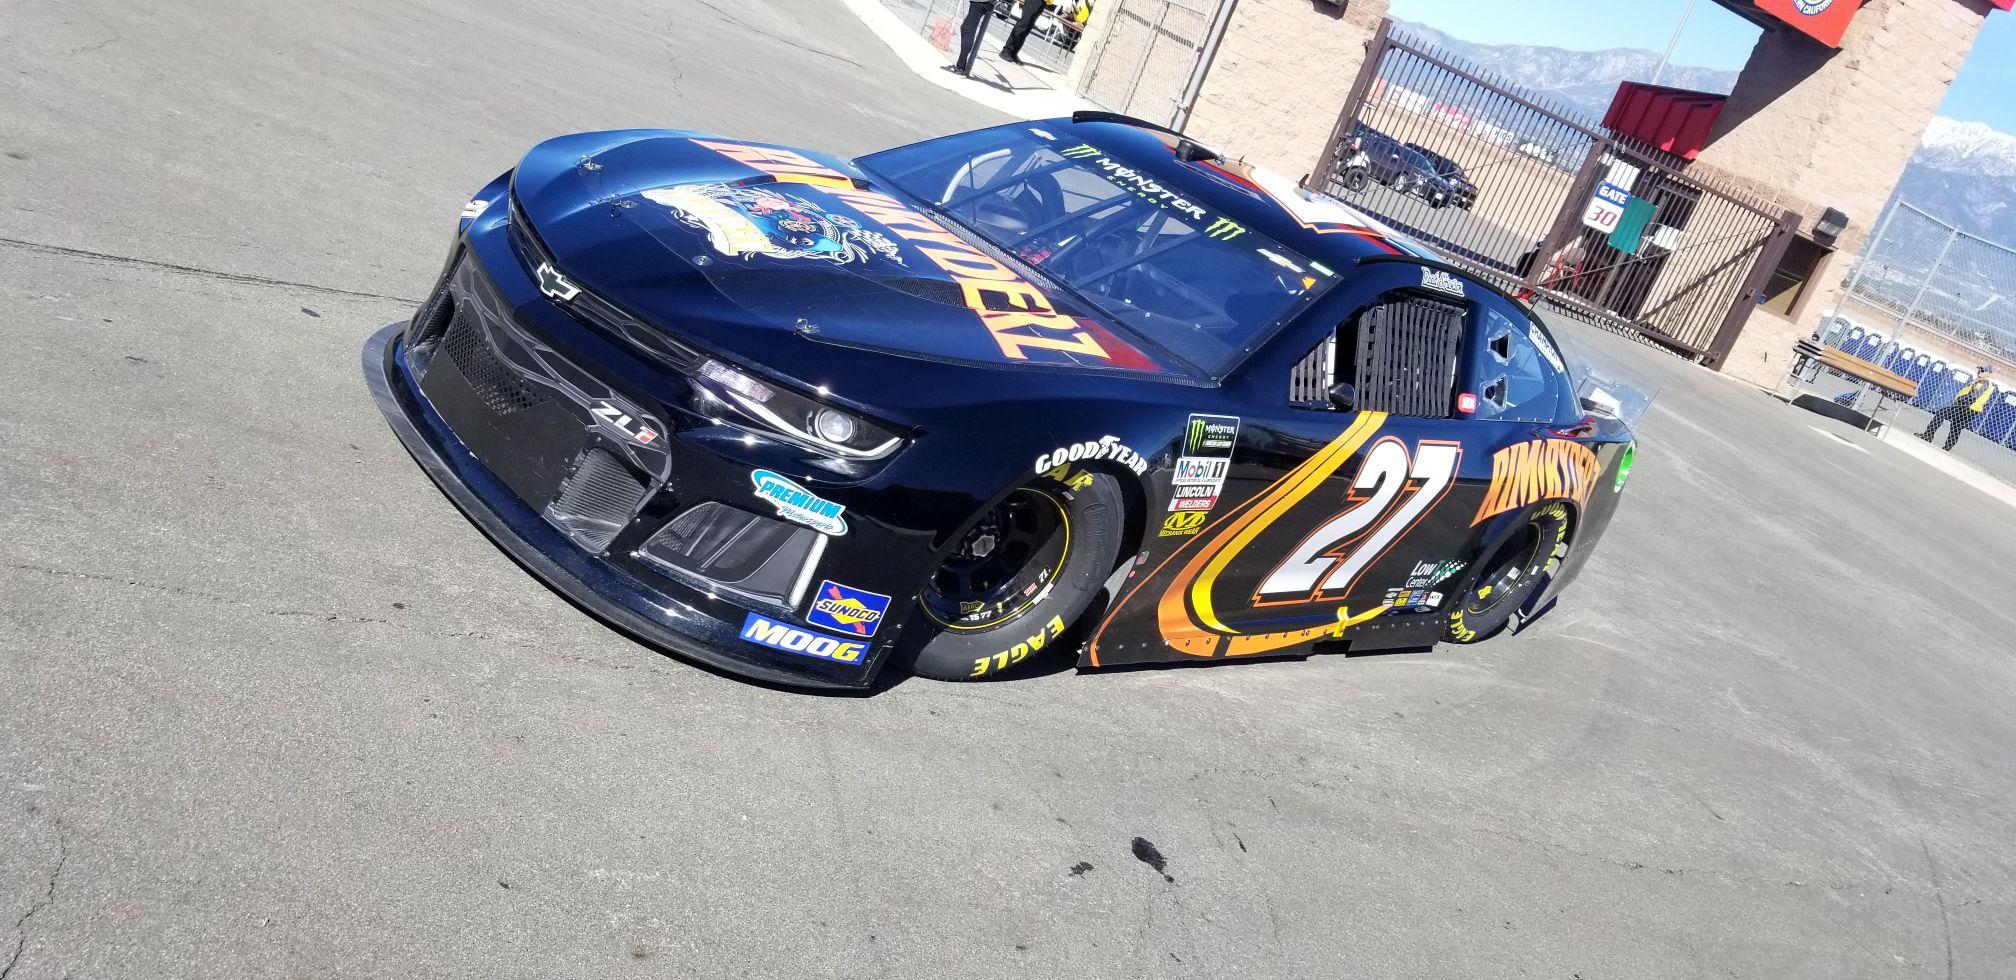 NASCAR teams receive big penalty for manipulating results of season finale - Racing News